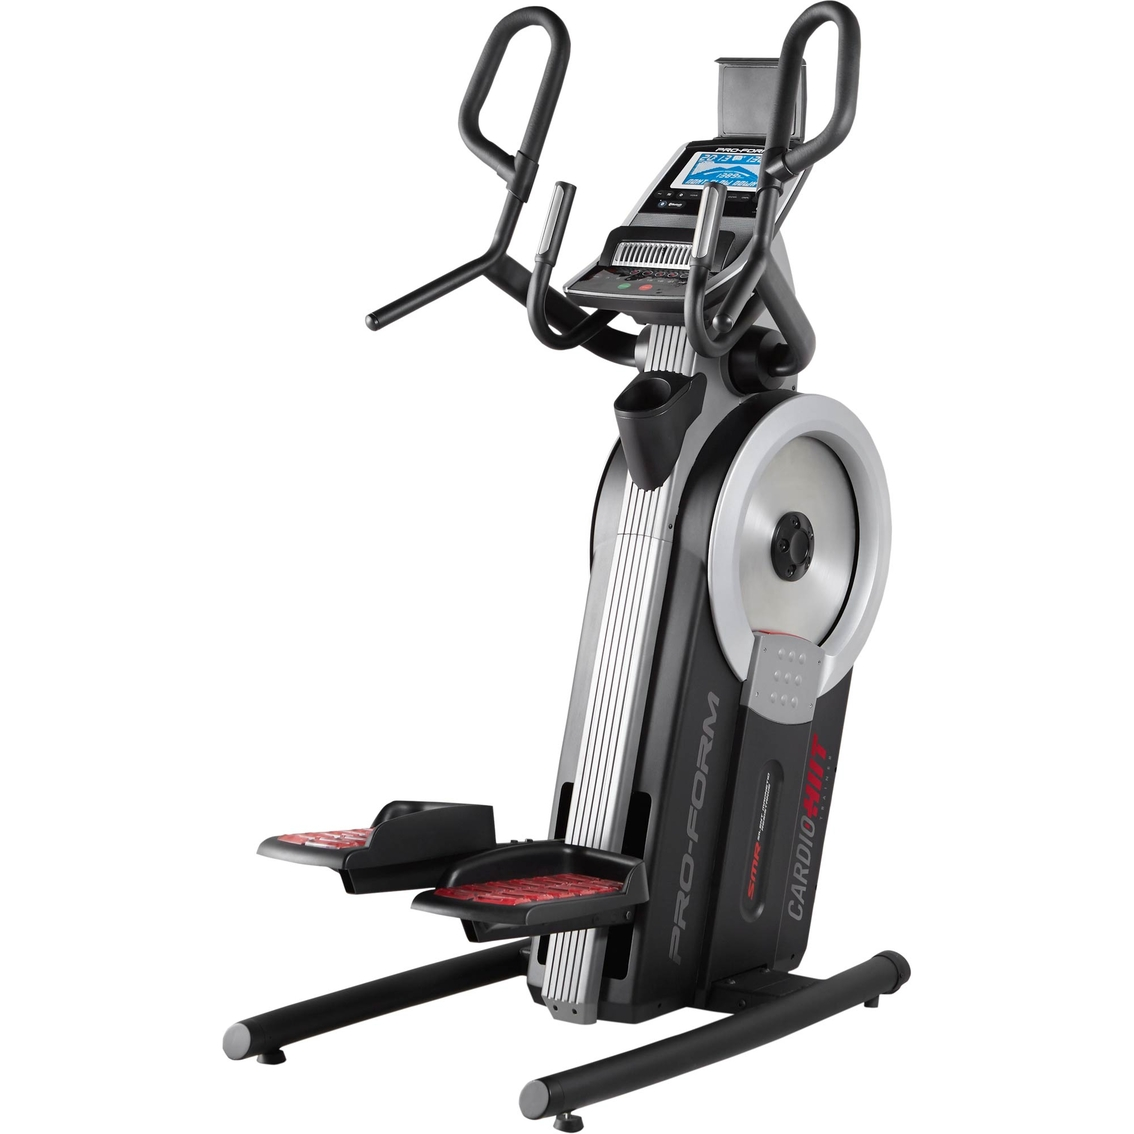 Proform Cardio Hiit Trainer Cardio Equipment Sports Outdoors